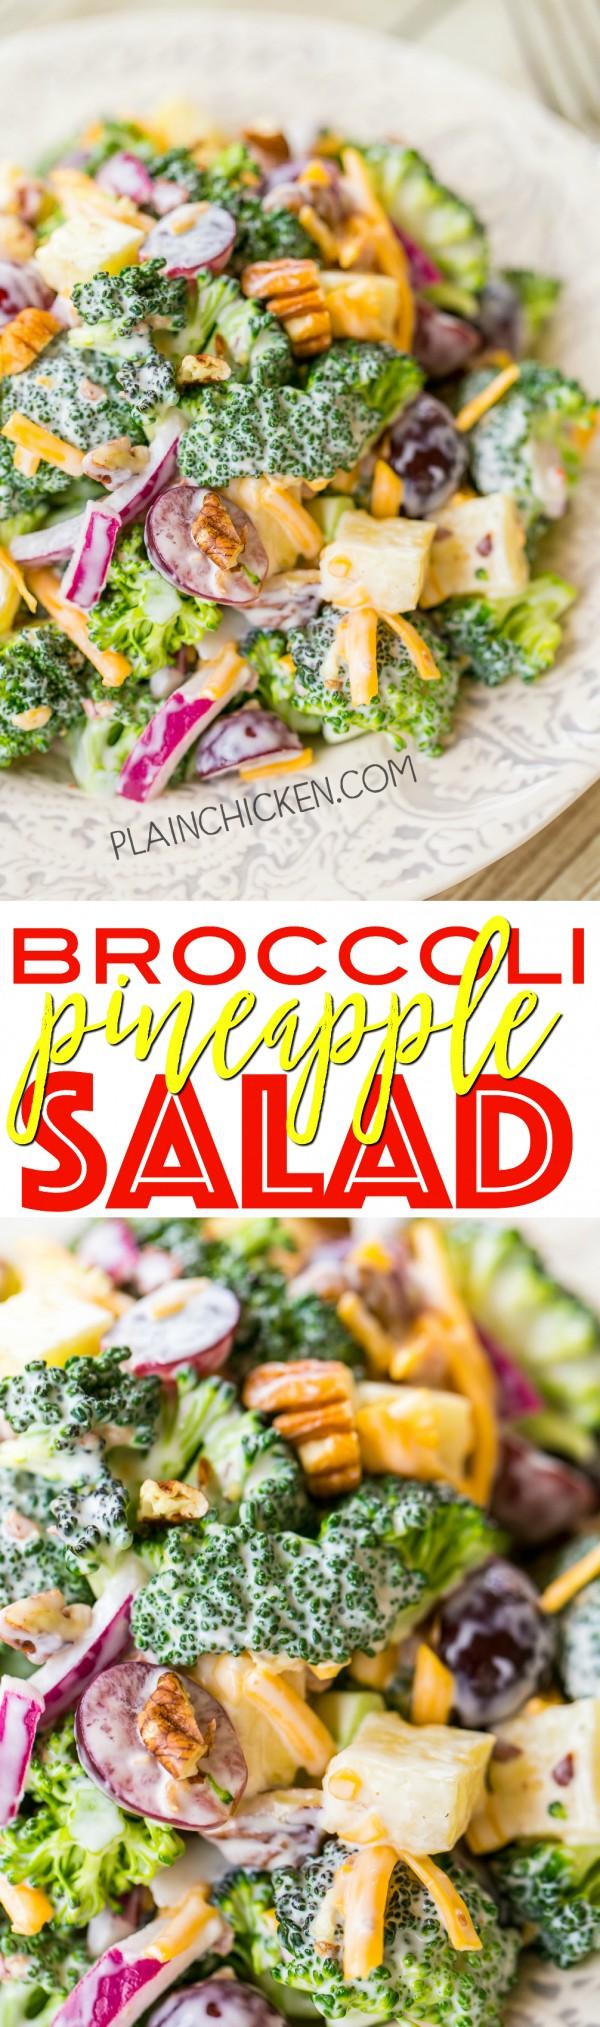 Get the recipe Broccoli Pineapple Salad @recipes_to_go